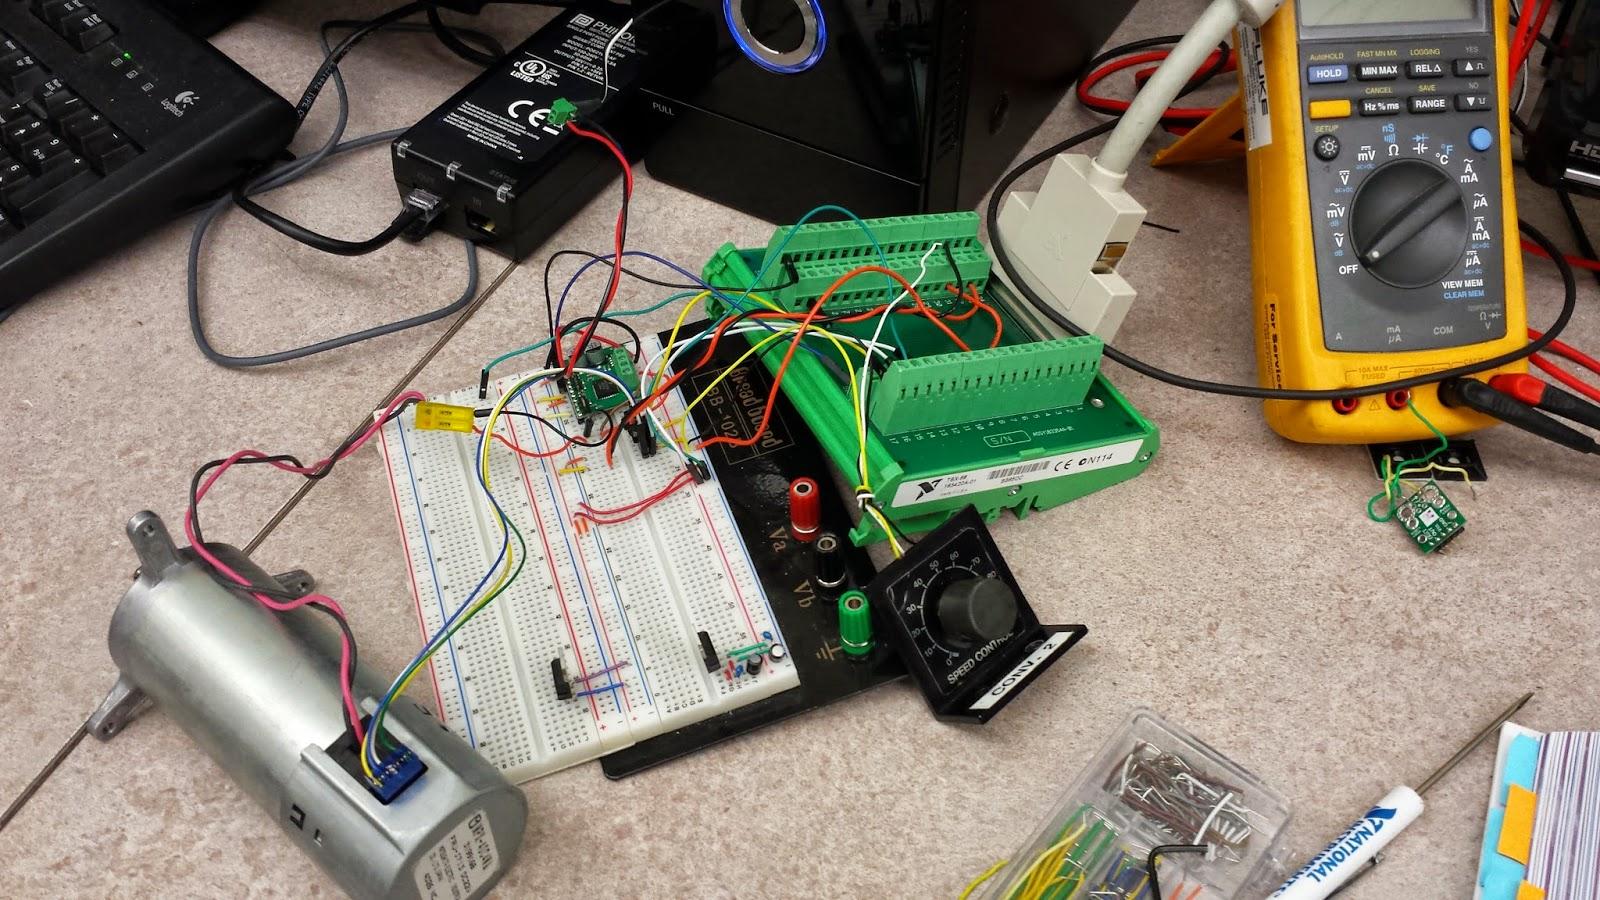 Rocket Science 2014 Wiring Cnc Diagram Controller 4060z Test Setup